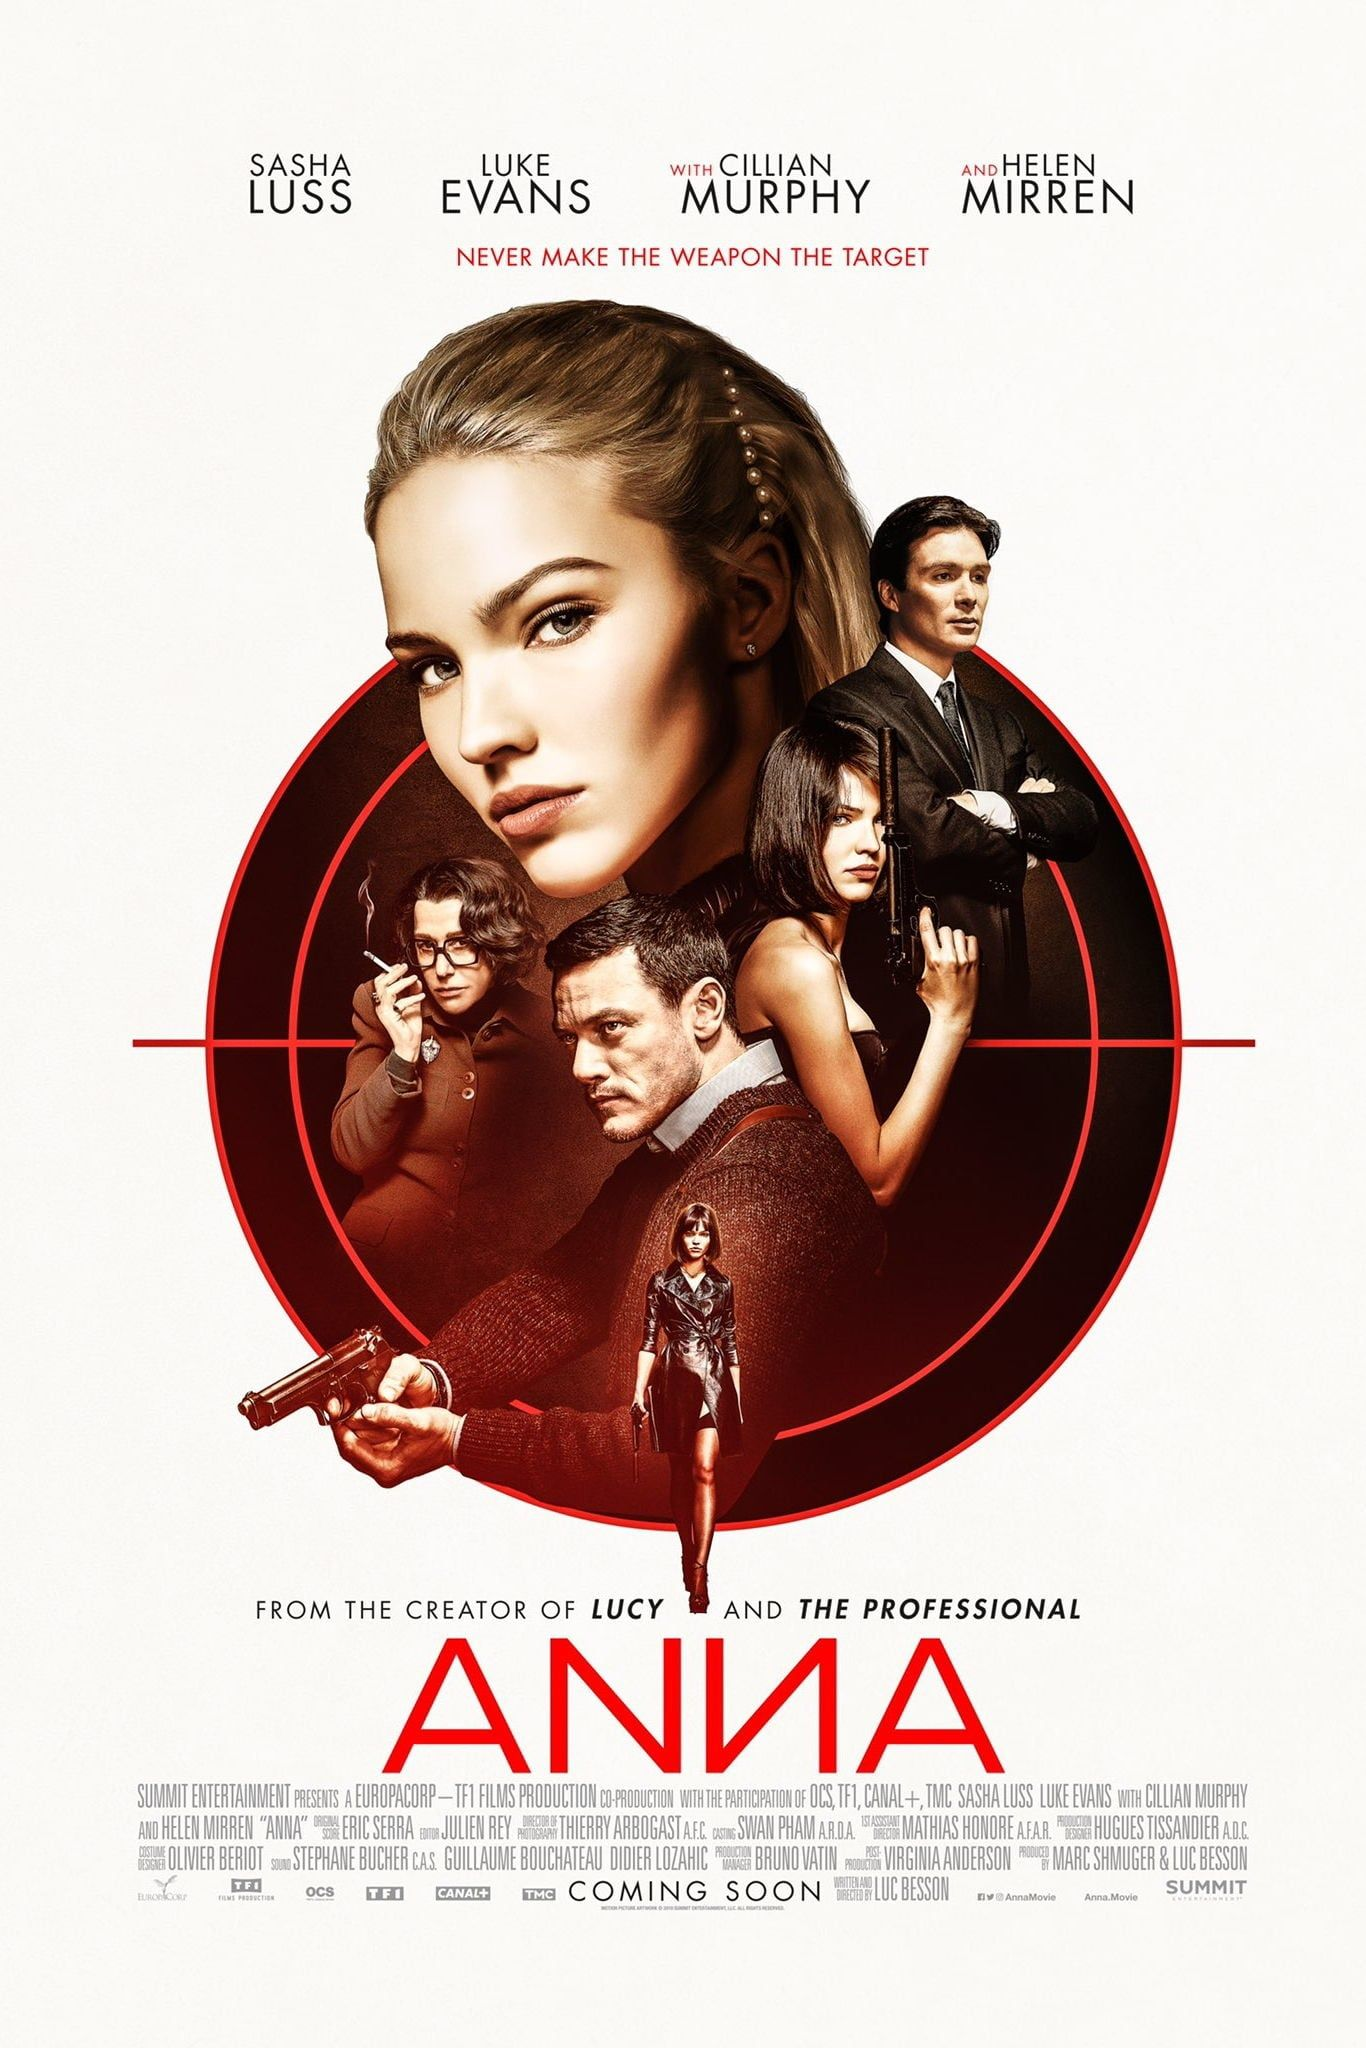 Anna Filme Cmplet Dublad Dwnlad Anna Movie Full Movies Anna